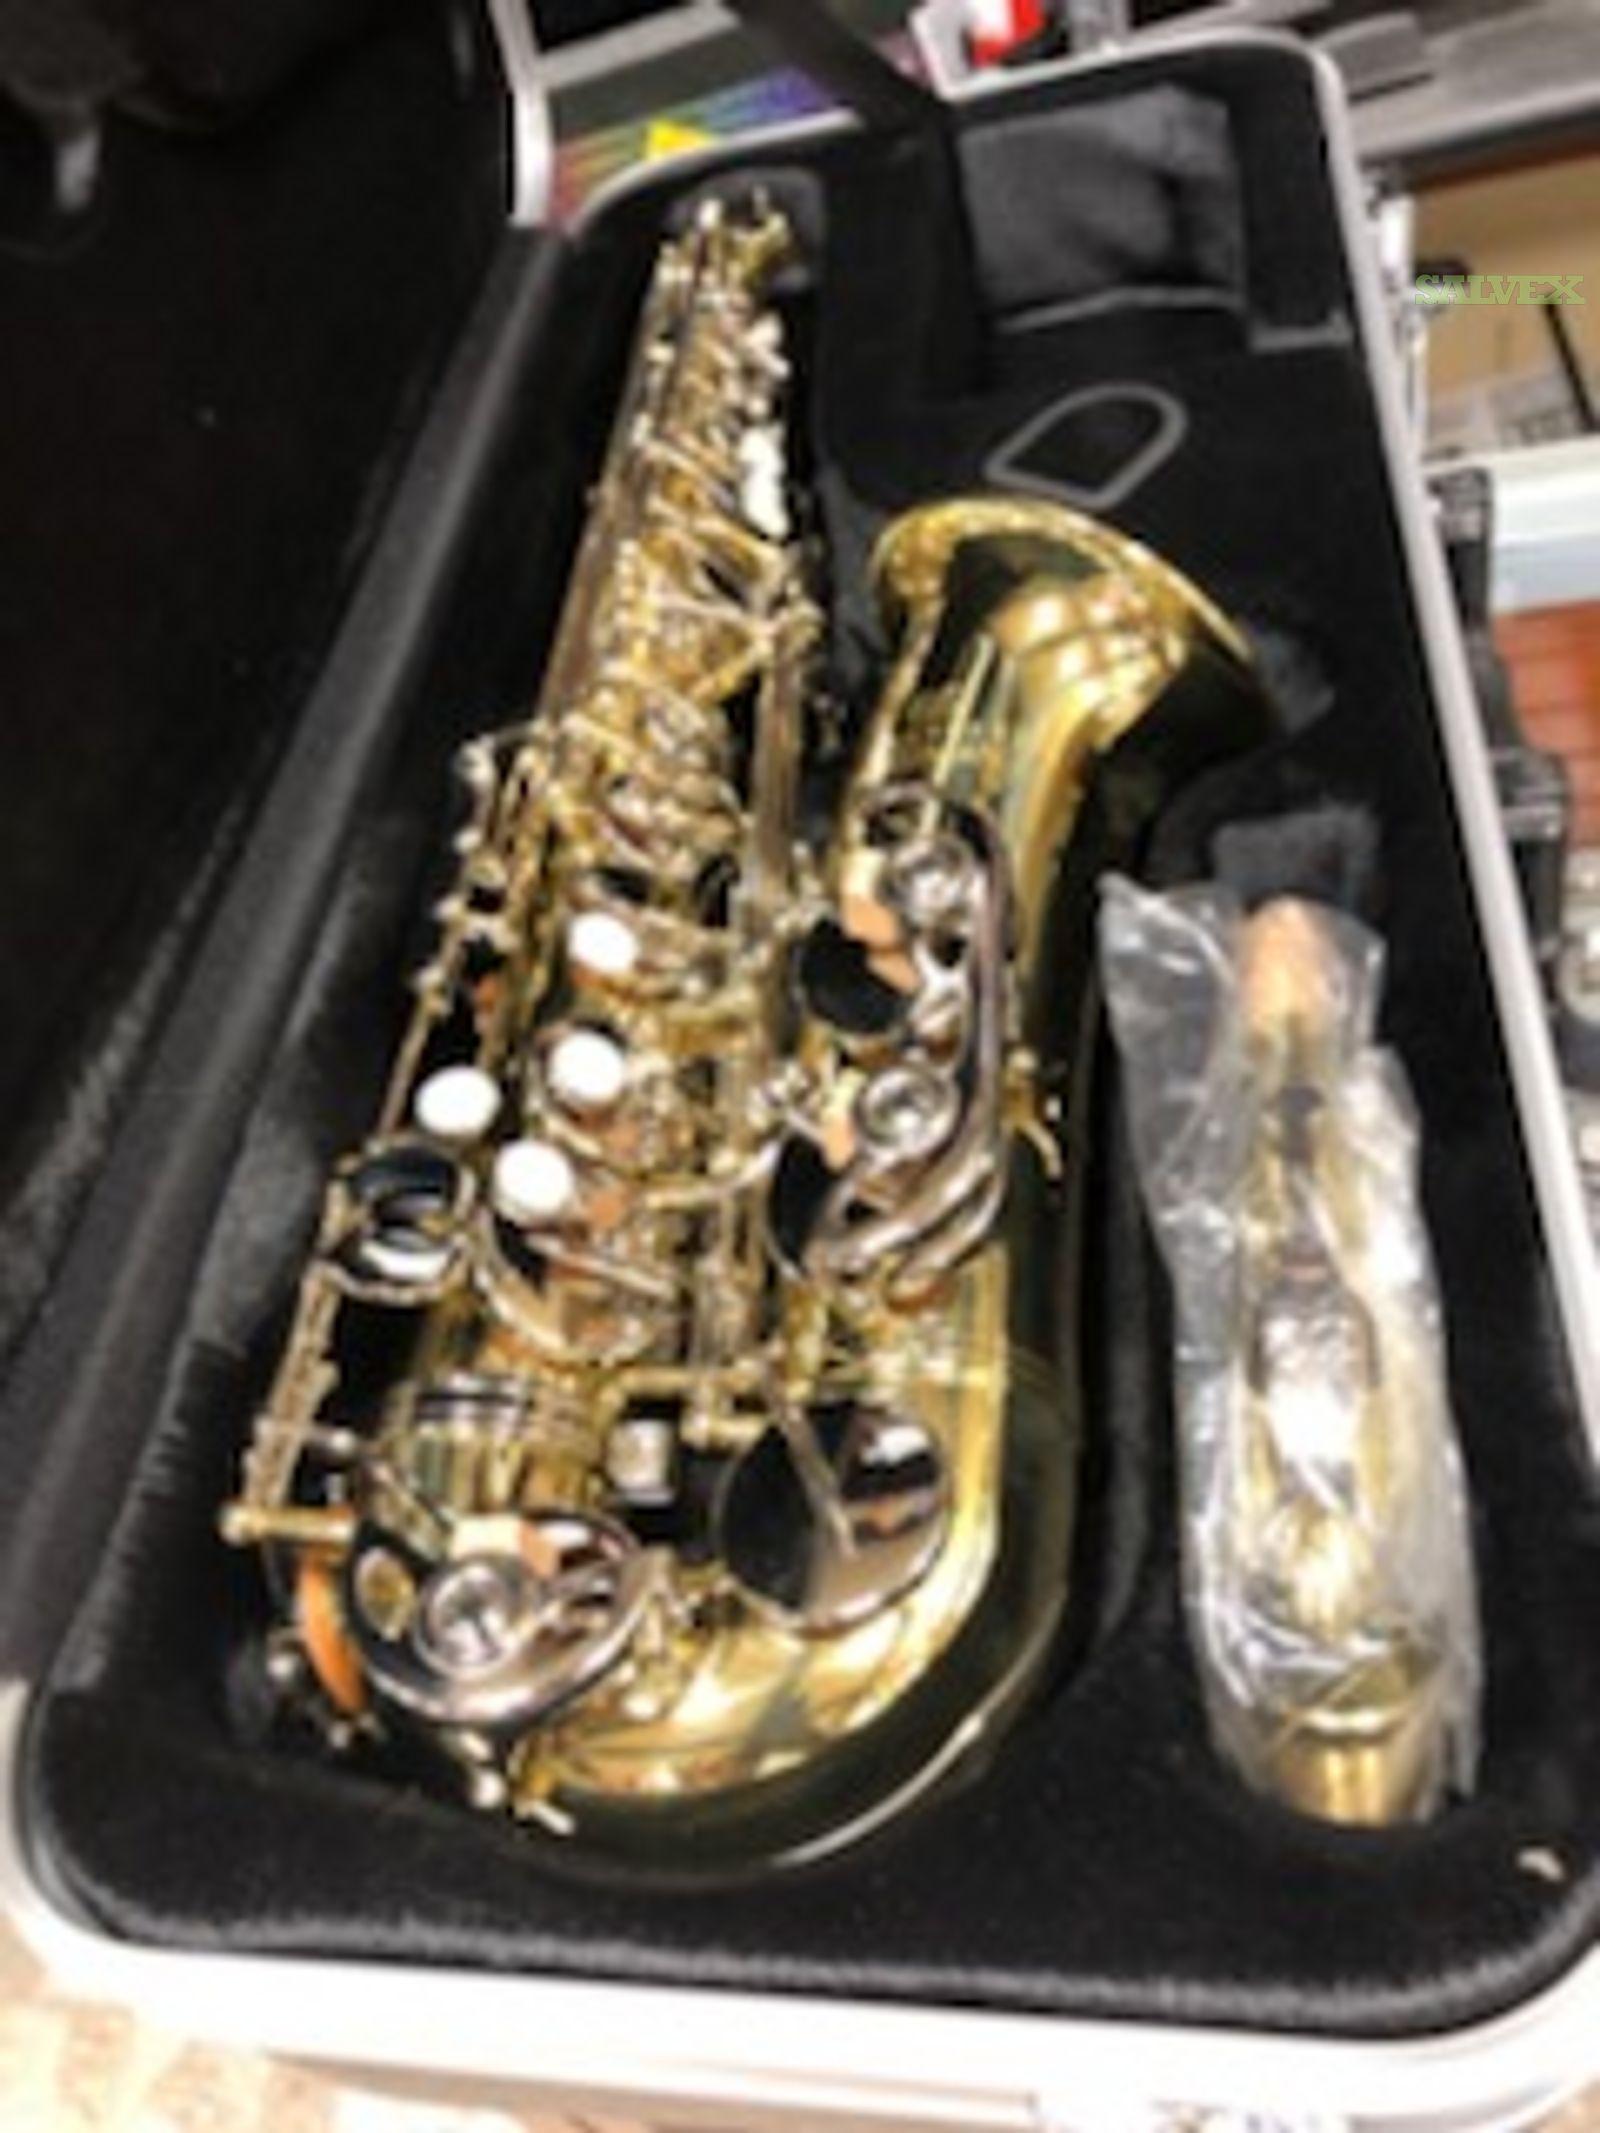 Musical Instruments: Andreas Eastman Saxophone, Haynes Amadeus  Flute, S.E. Shires Trombone, Euphonium, Trumpets in California (12 Pieces)